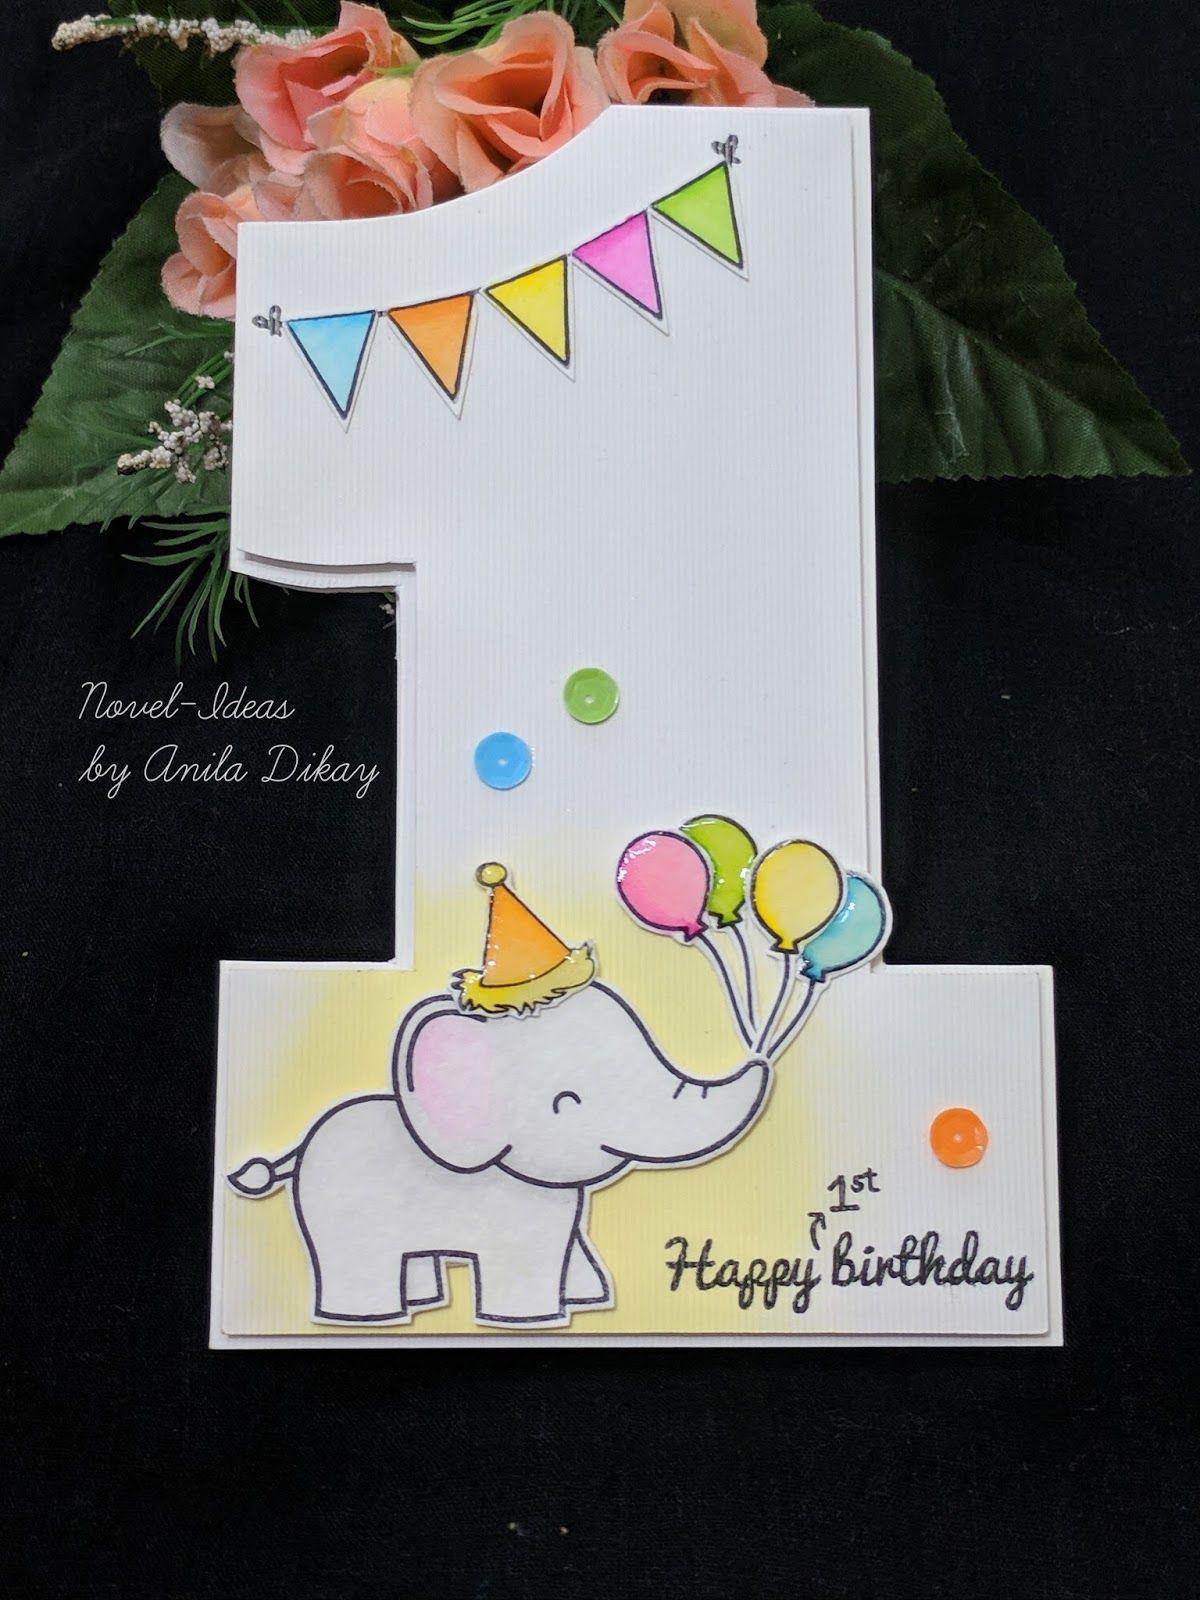 Novel Ideas Happy 1st Birthday Math Challenge 1st Birthday Cards Birthday Card Drawing First Birthday Cards